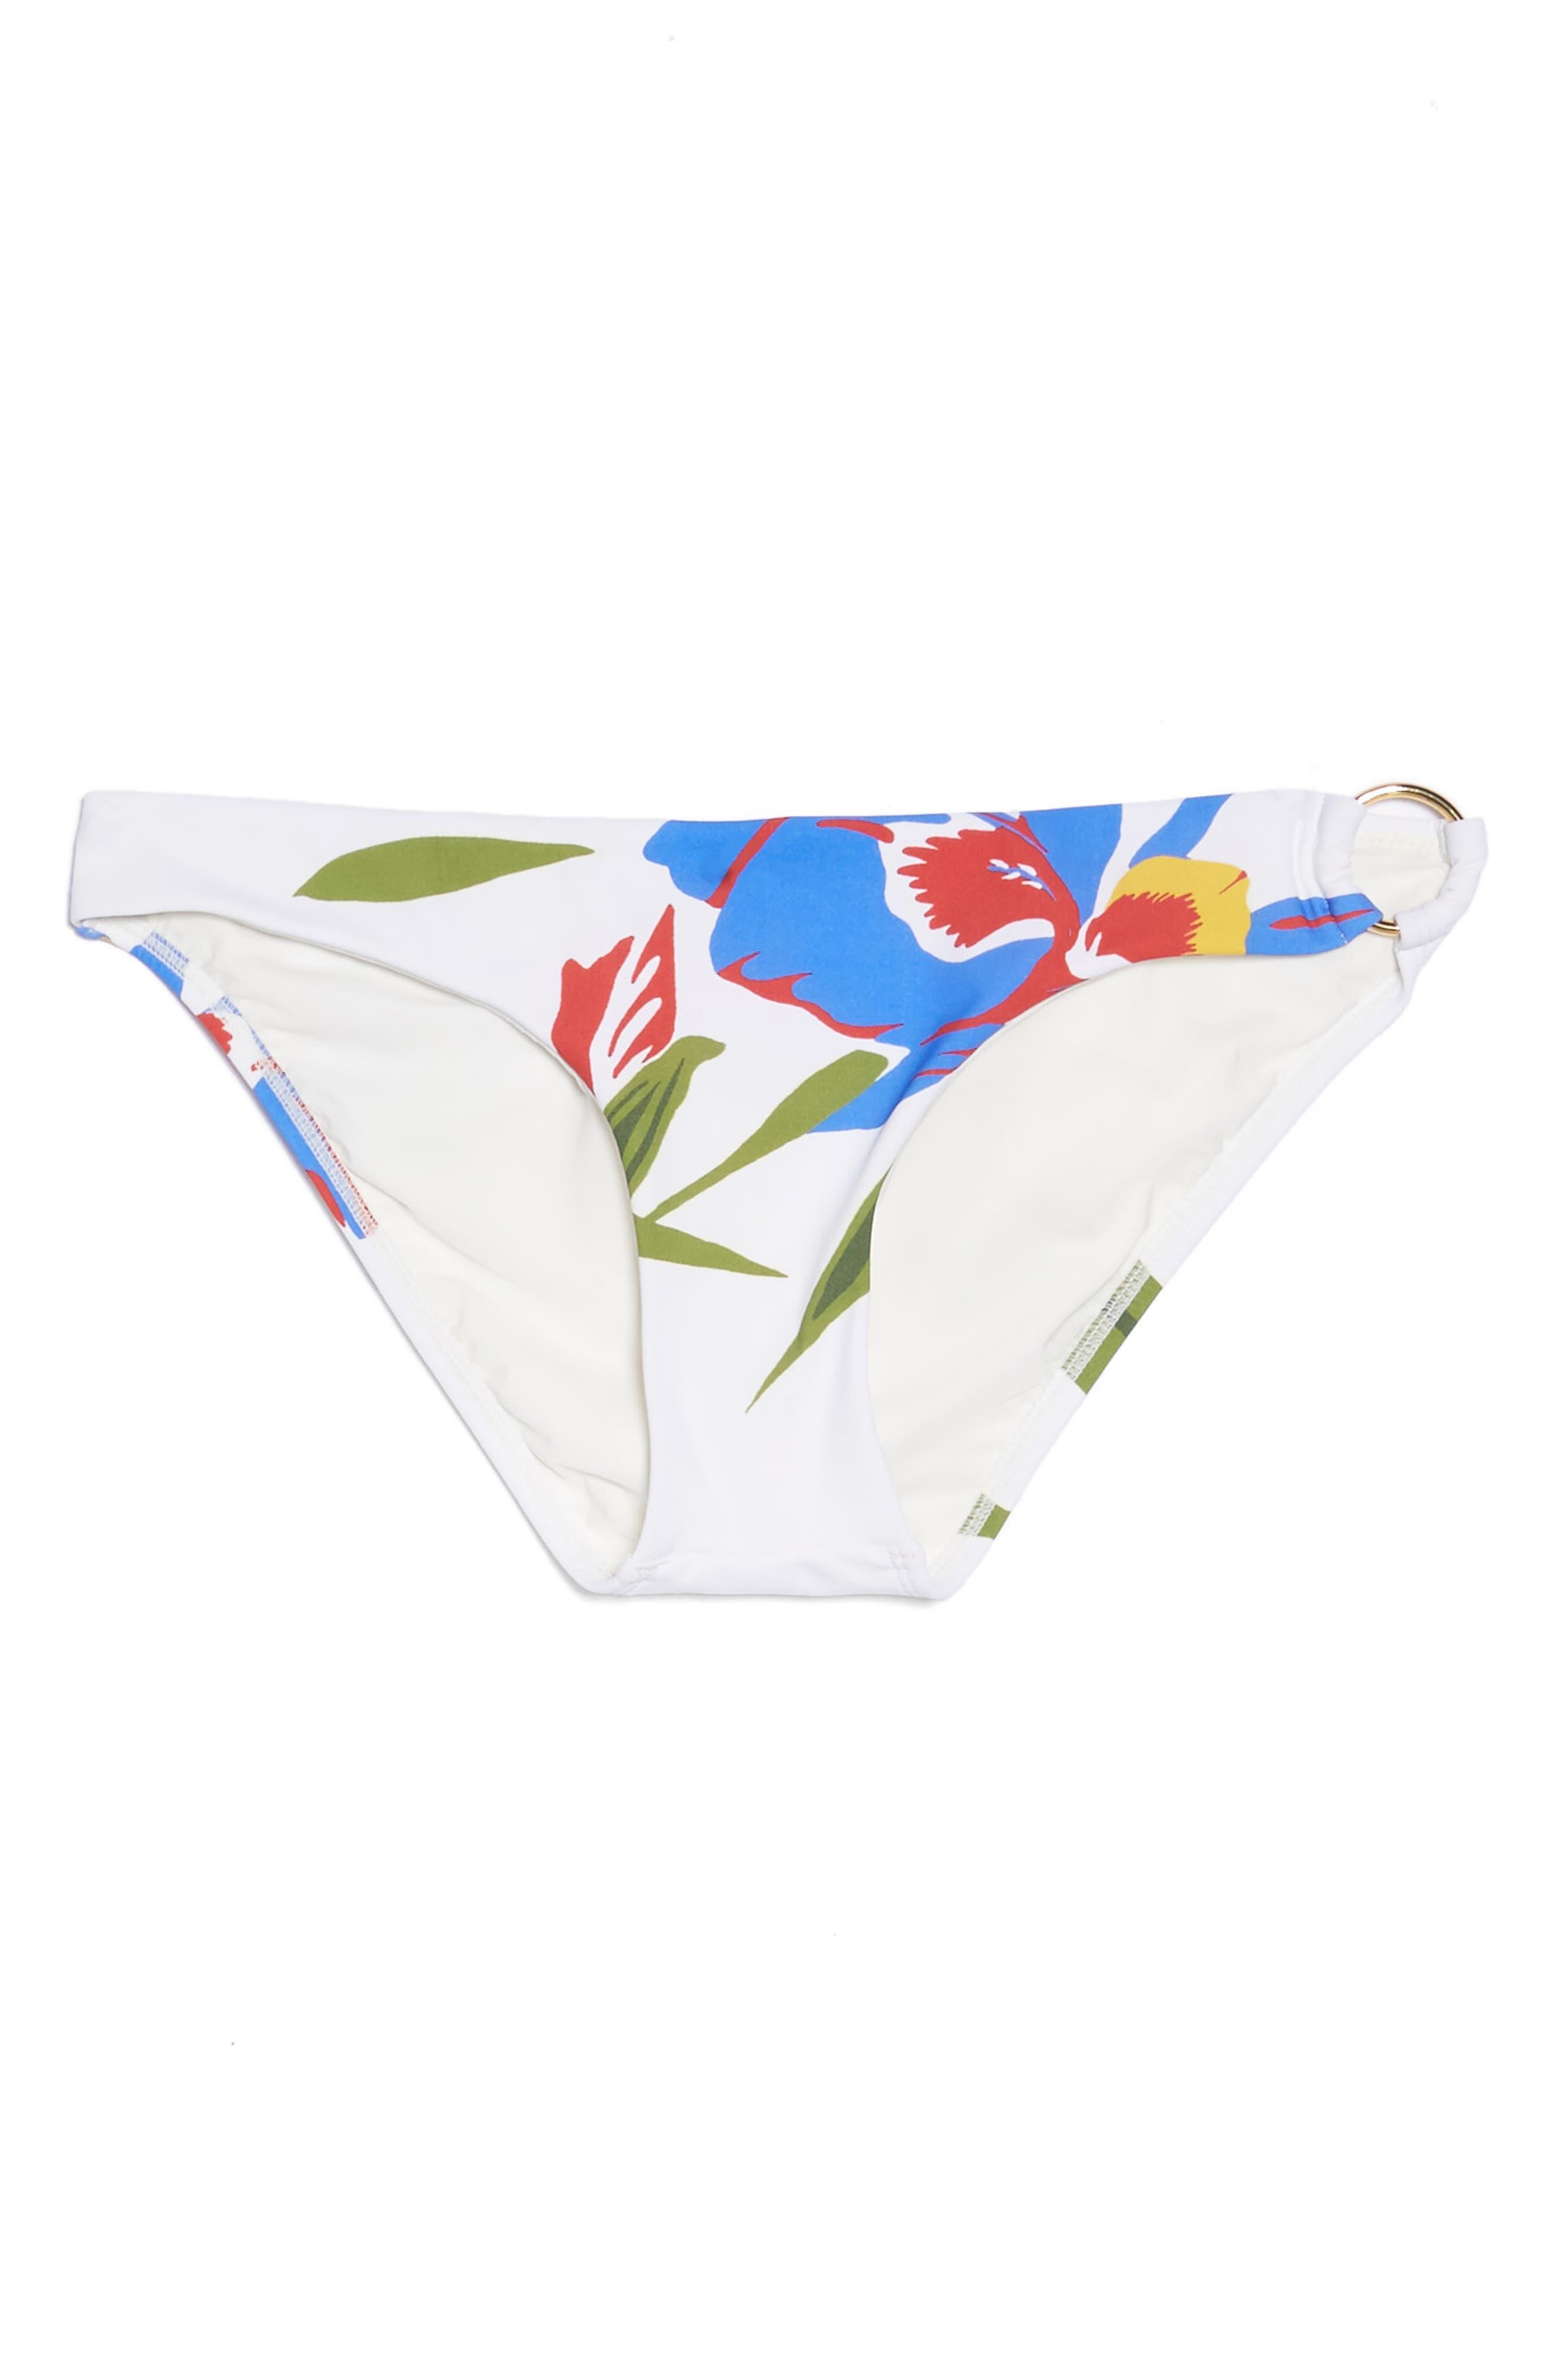 Hipster Bikini Bottoms,                             Alternate thumbnail 6, color,                             400